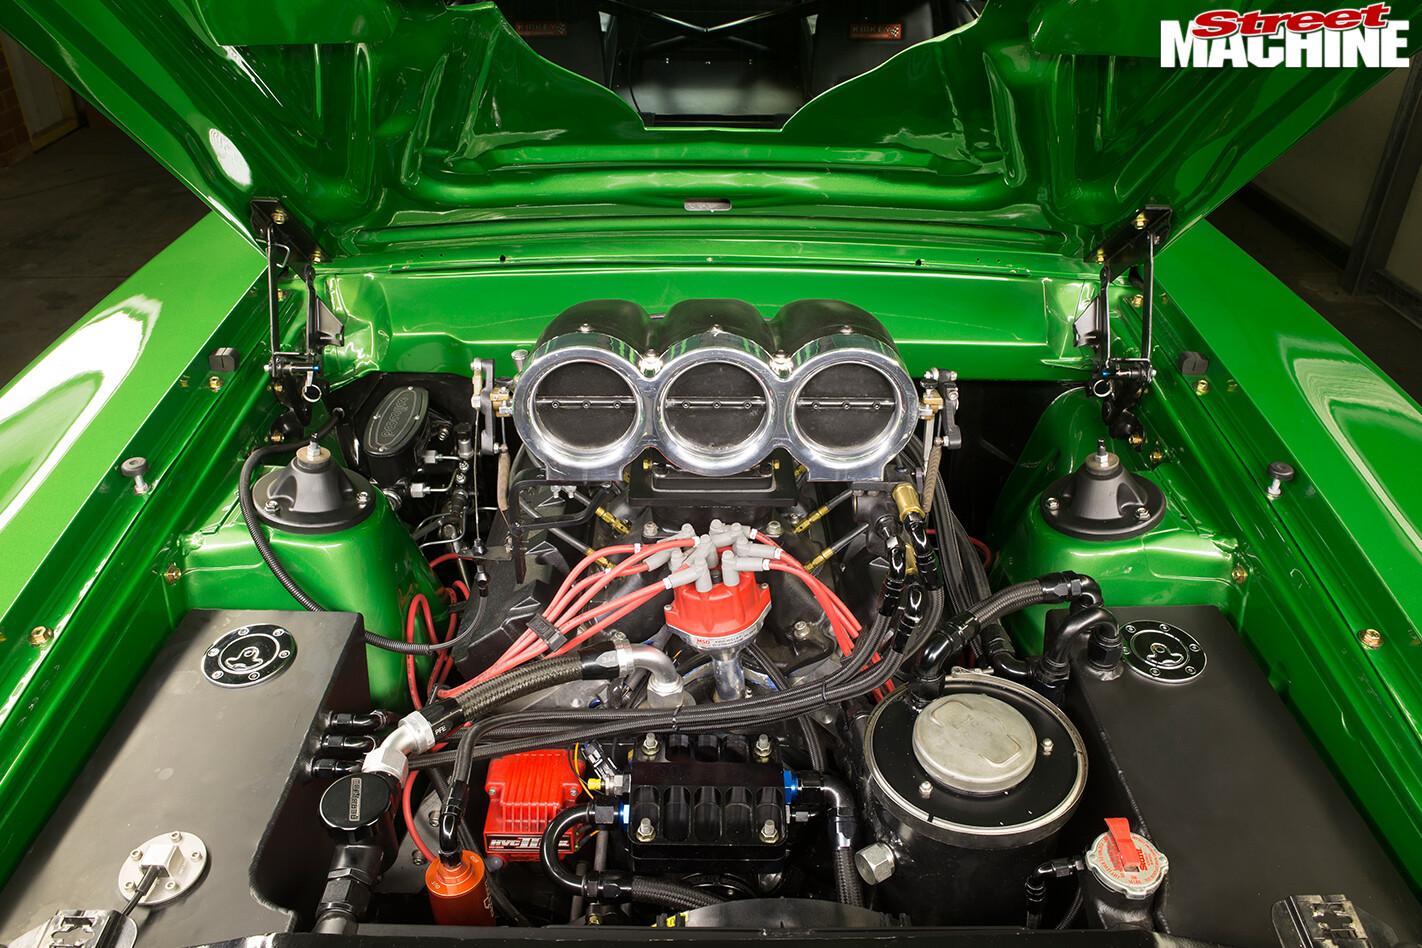 Ford -XA-Falcon -engine -bay